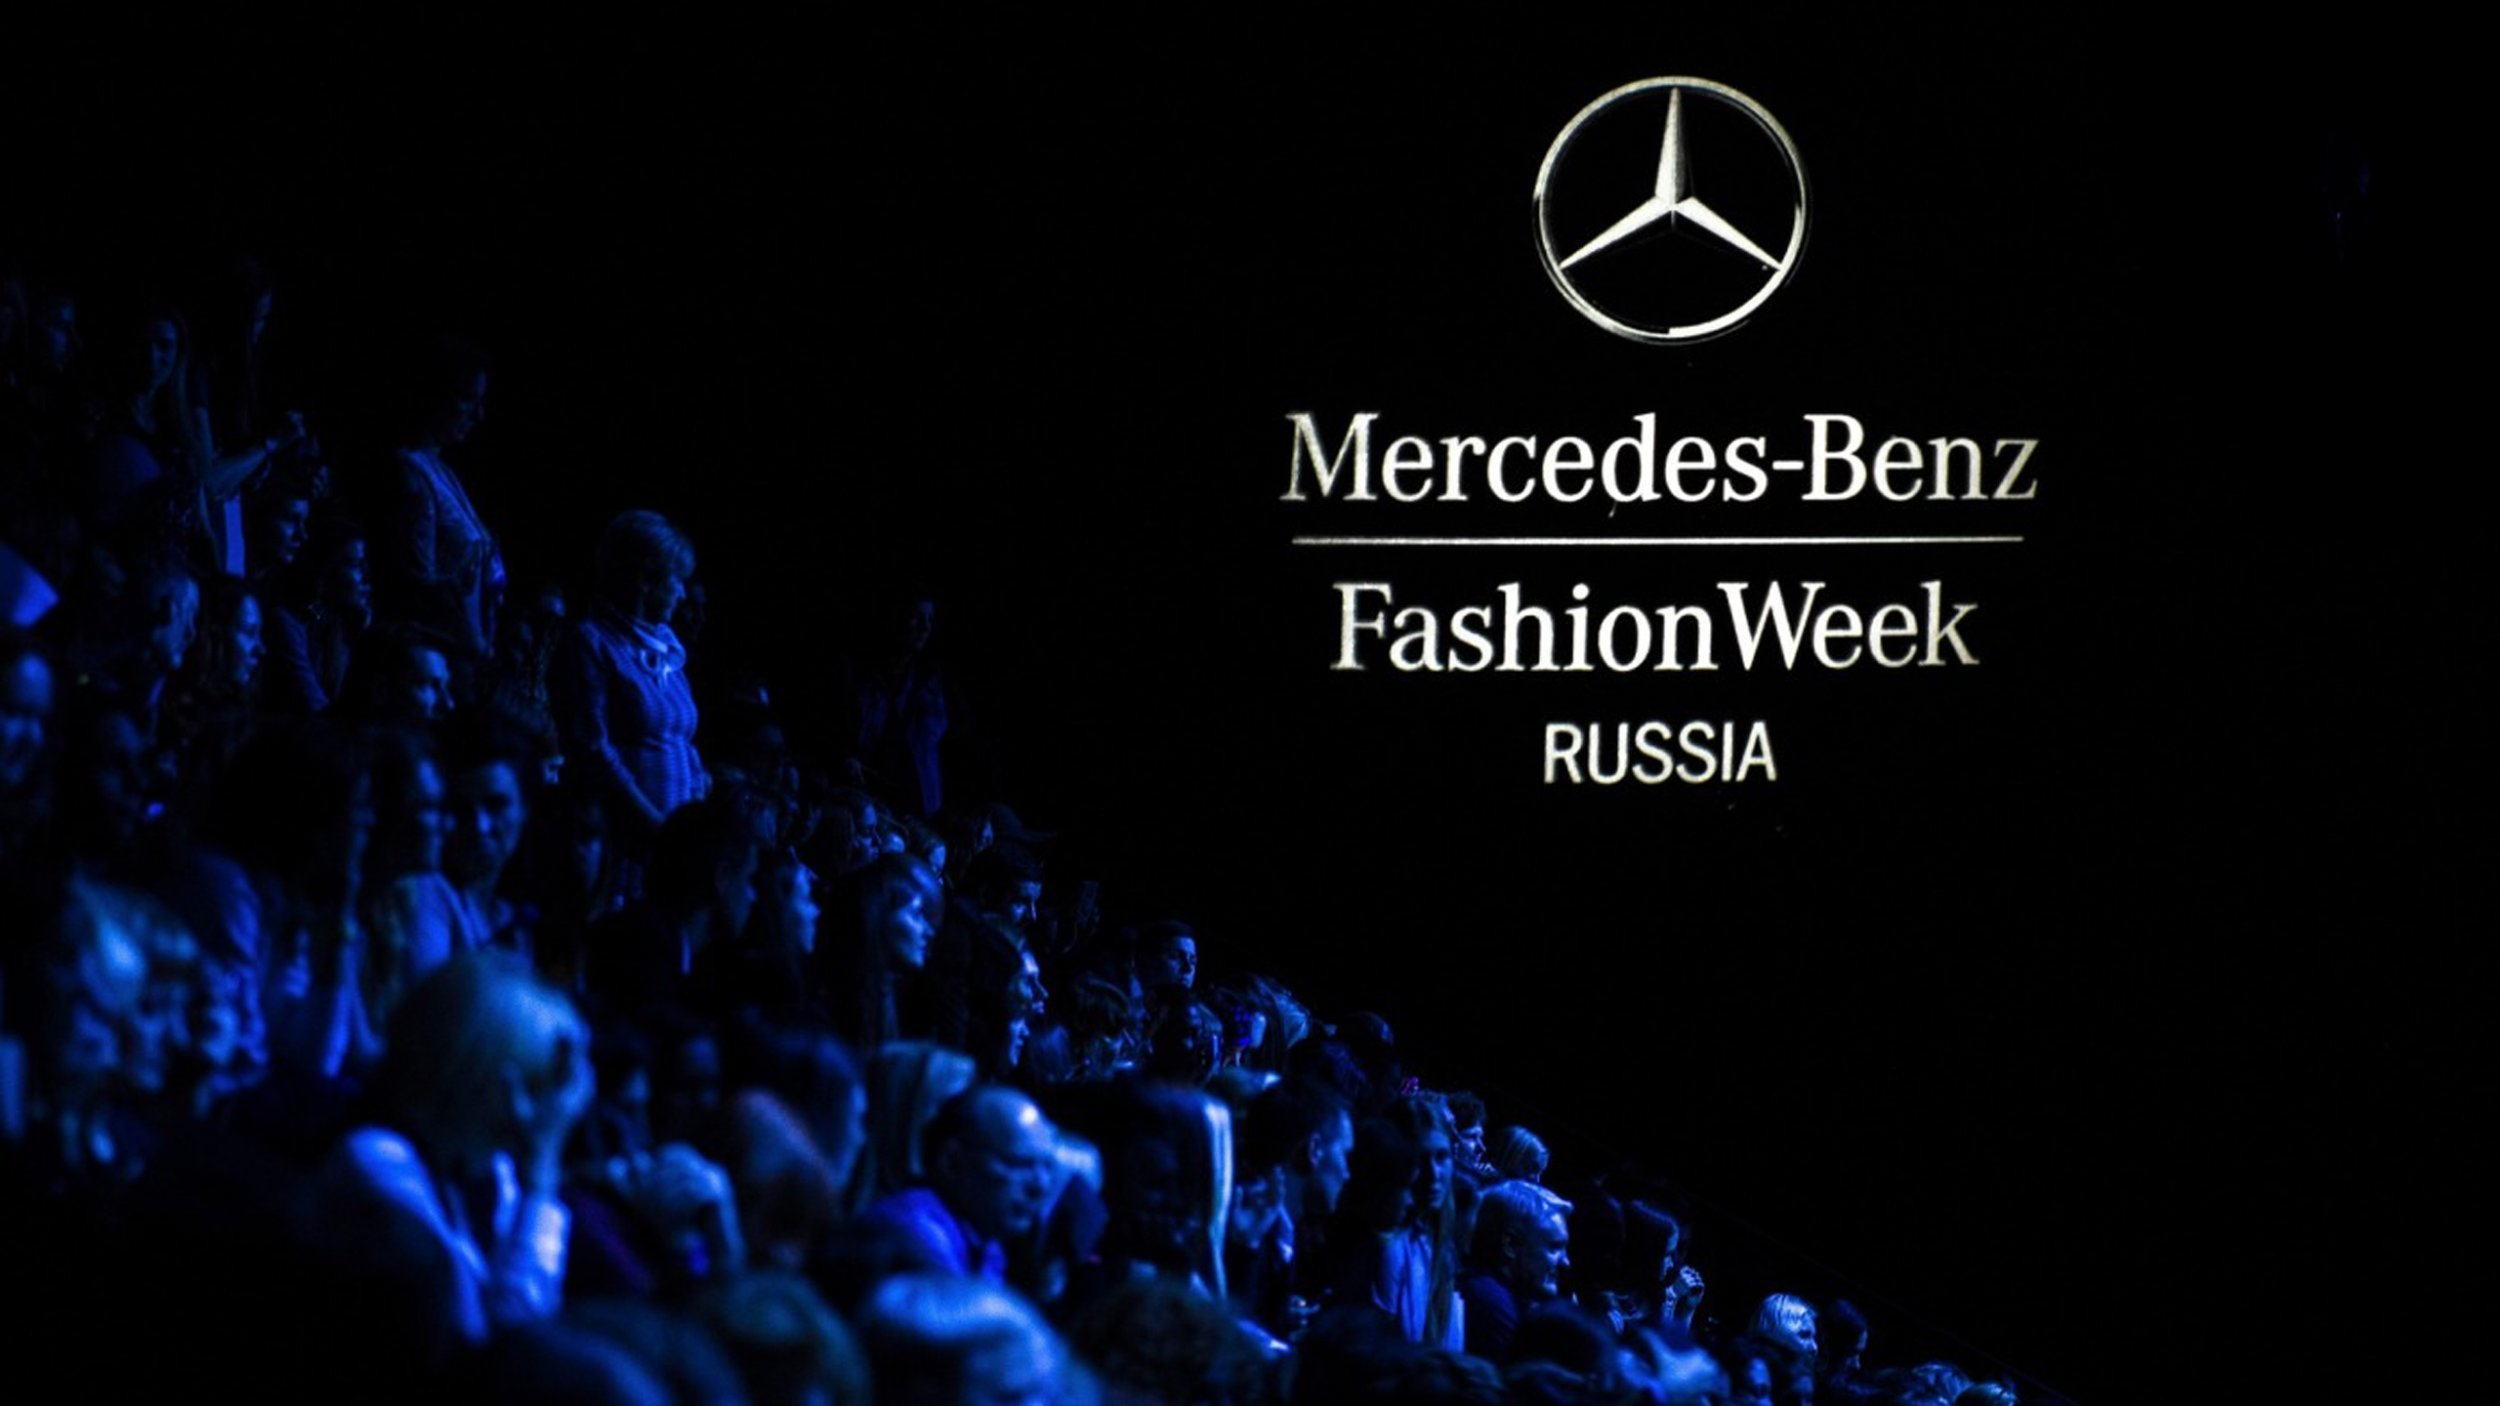 https://cloud.mb-lounge.com/files/HQ-Events/Lifestyle/Fashion/event-calendar-mbfw-russia-2560x1440.jpg